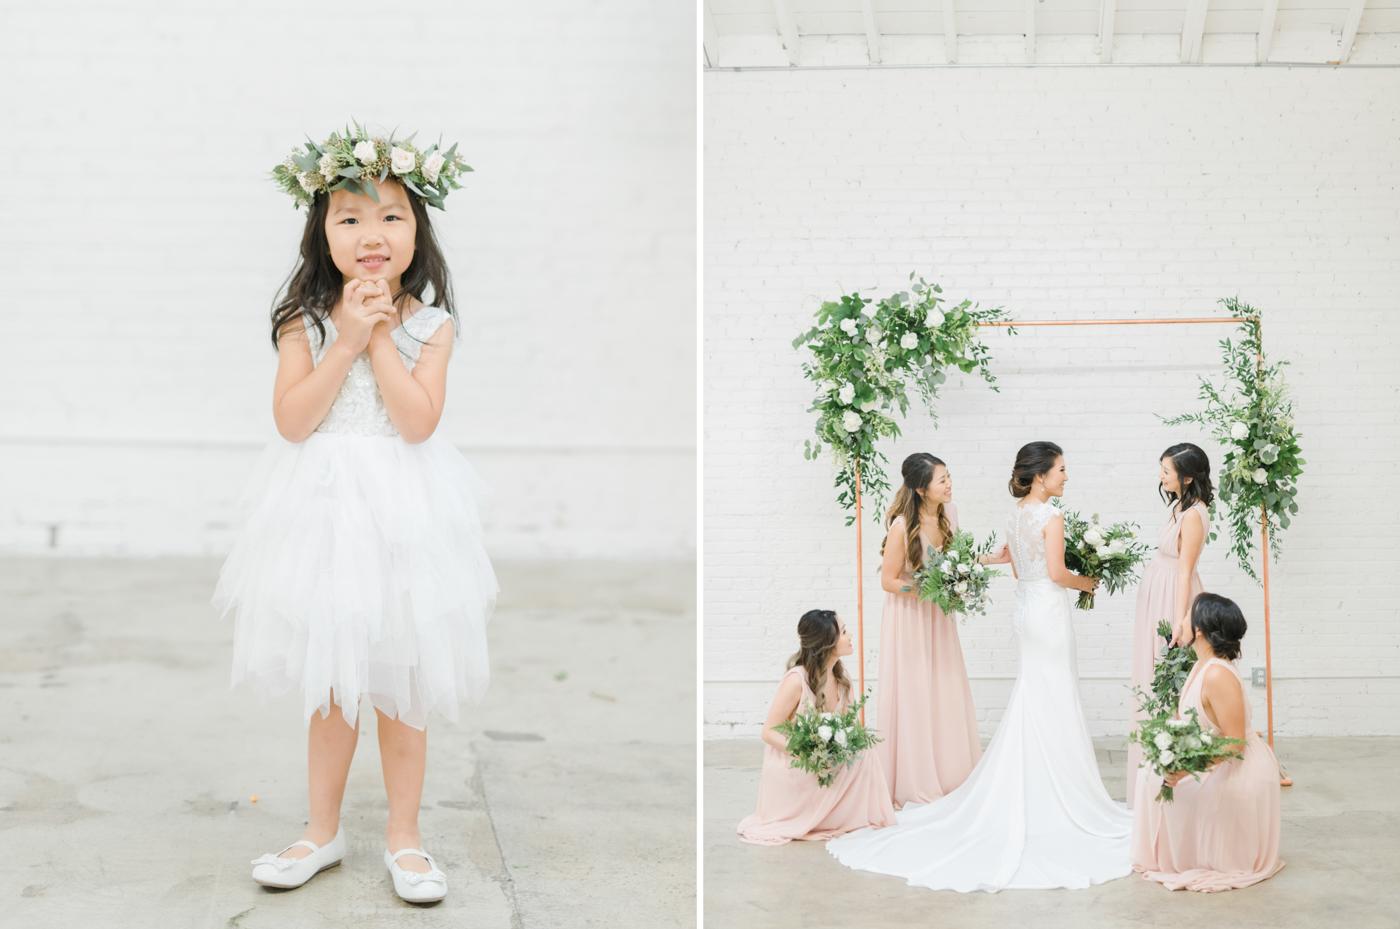 Modern_Wedding_HNYPT_Honeypot_LA_Photographer_Los_Angeles-20.jpg